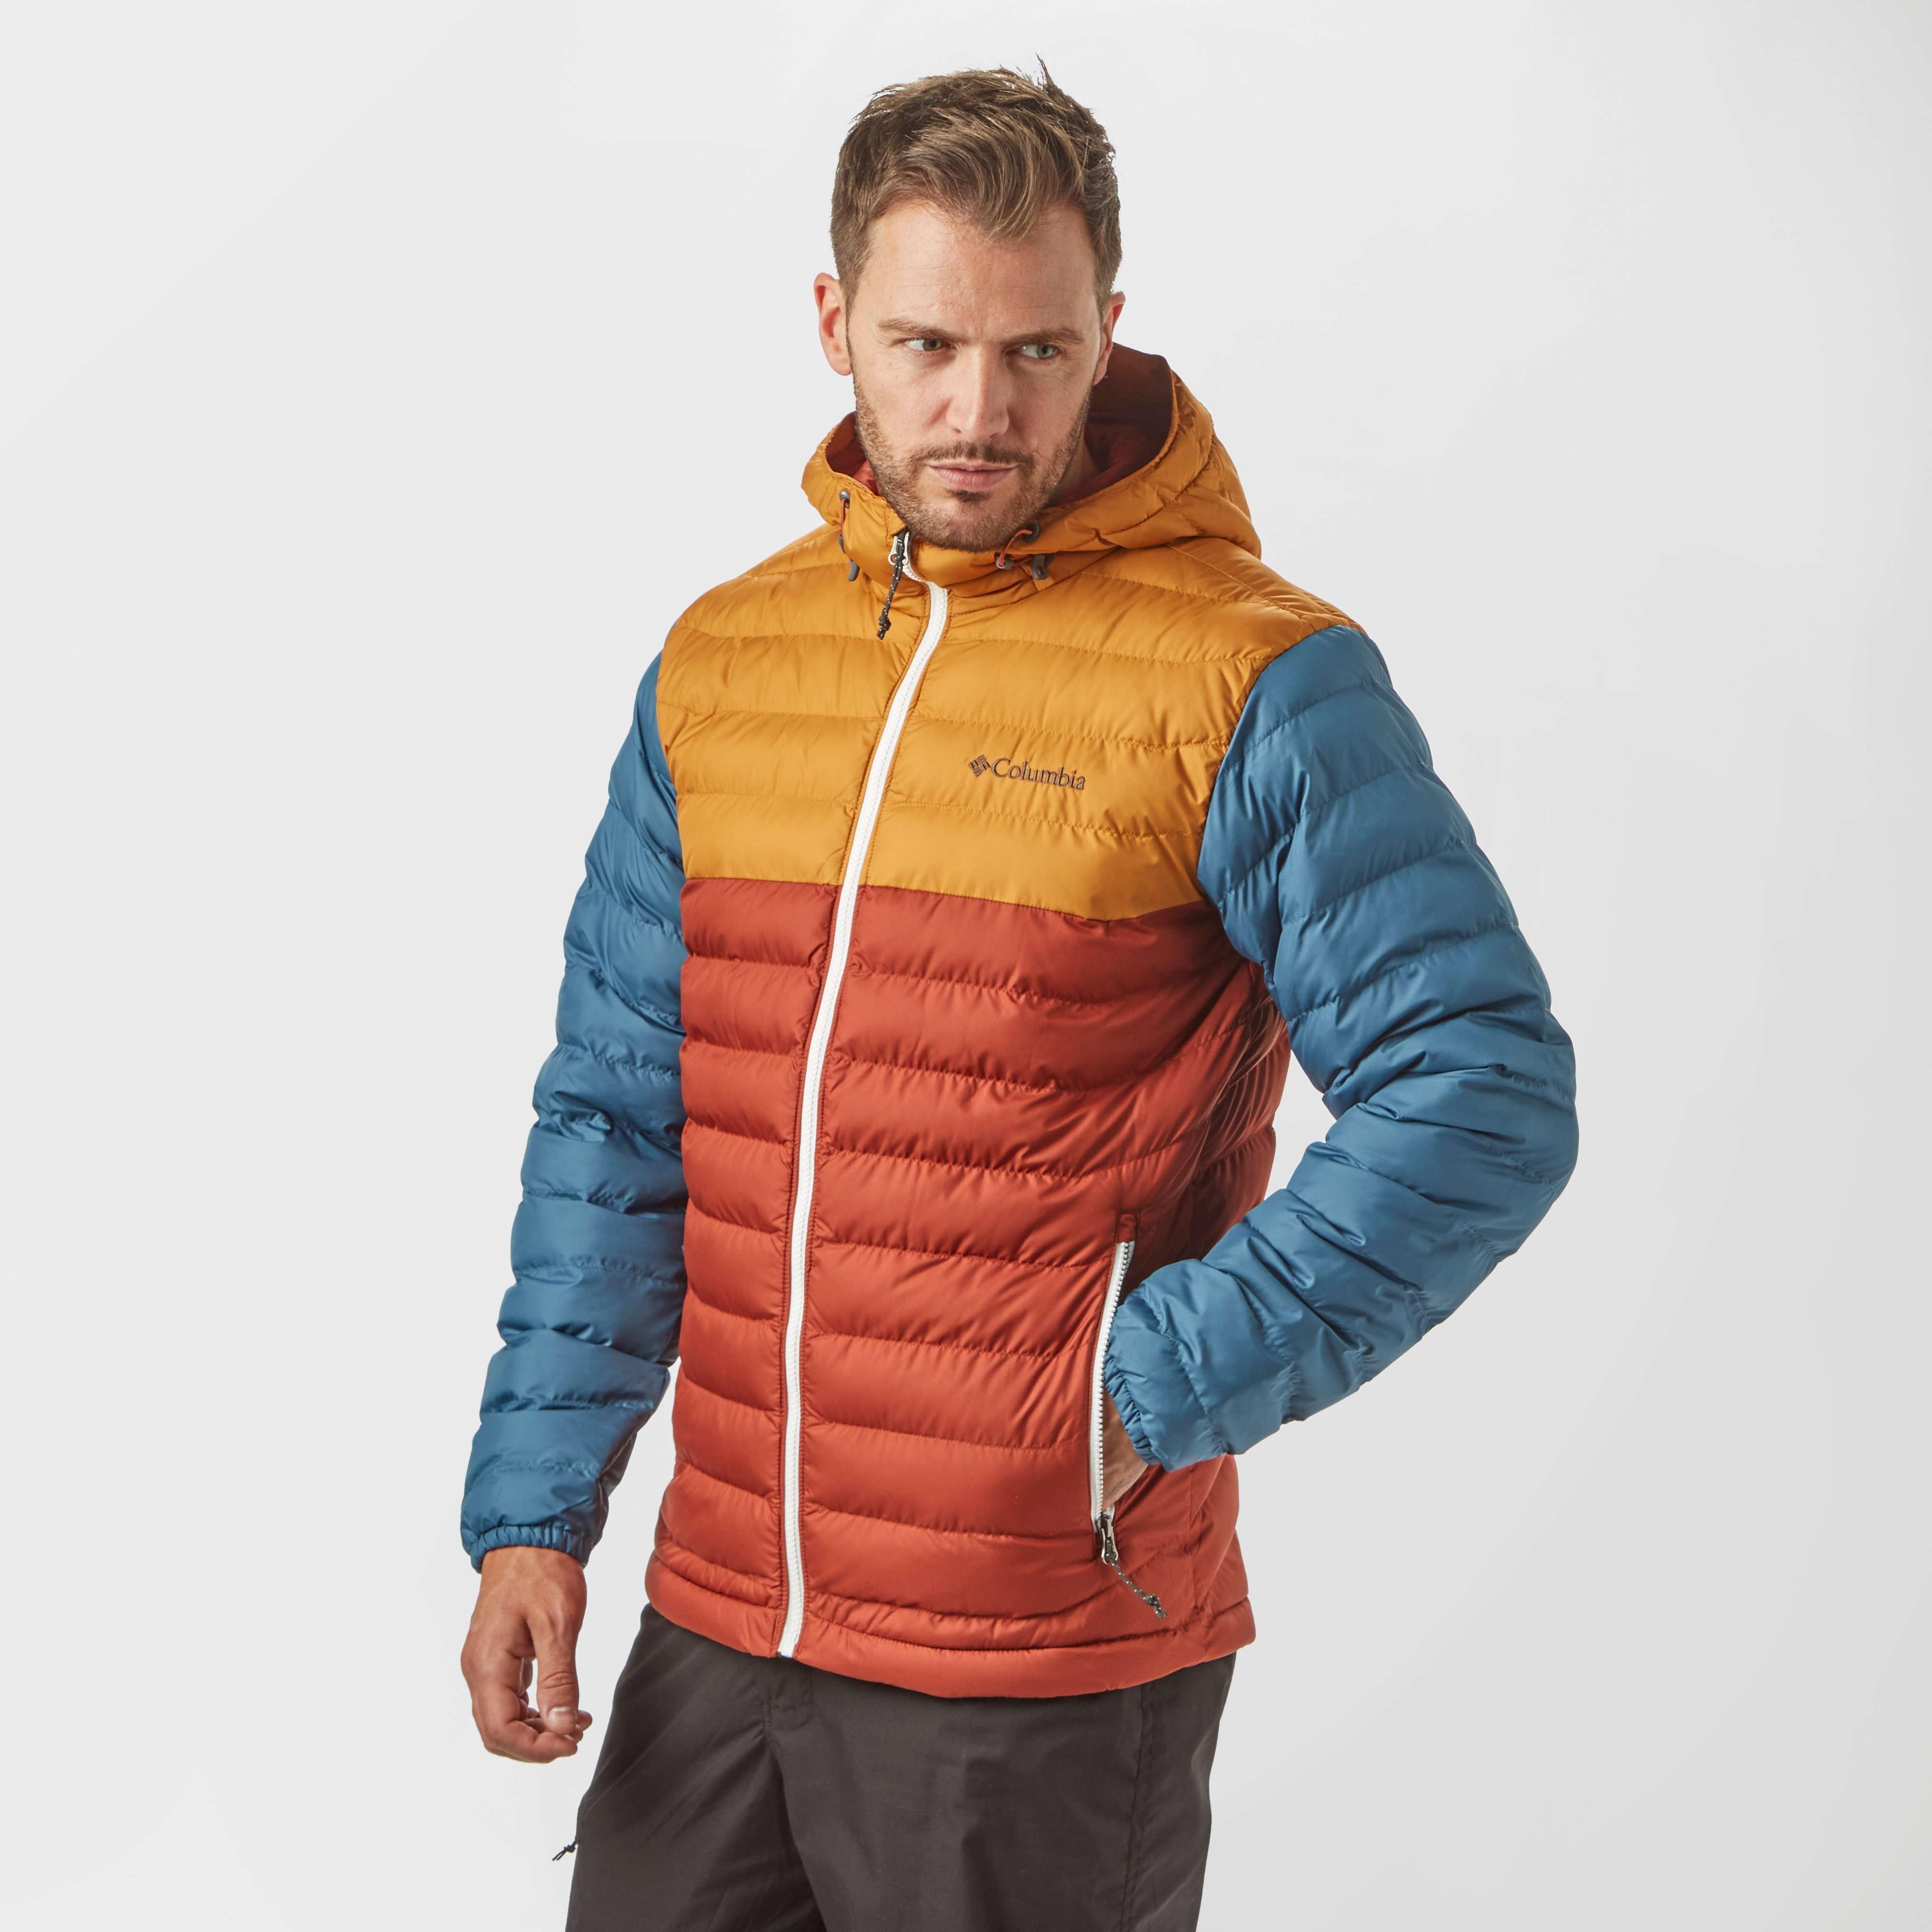 COLUMBIA Men's Powder Lite™ Hooded Jacket